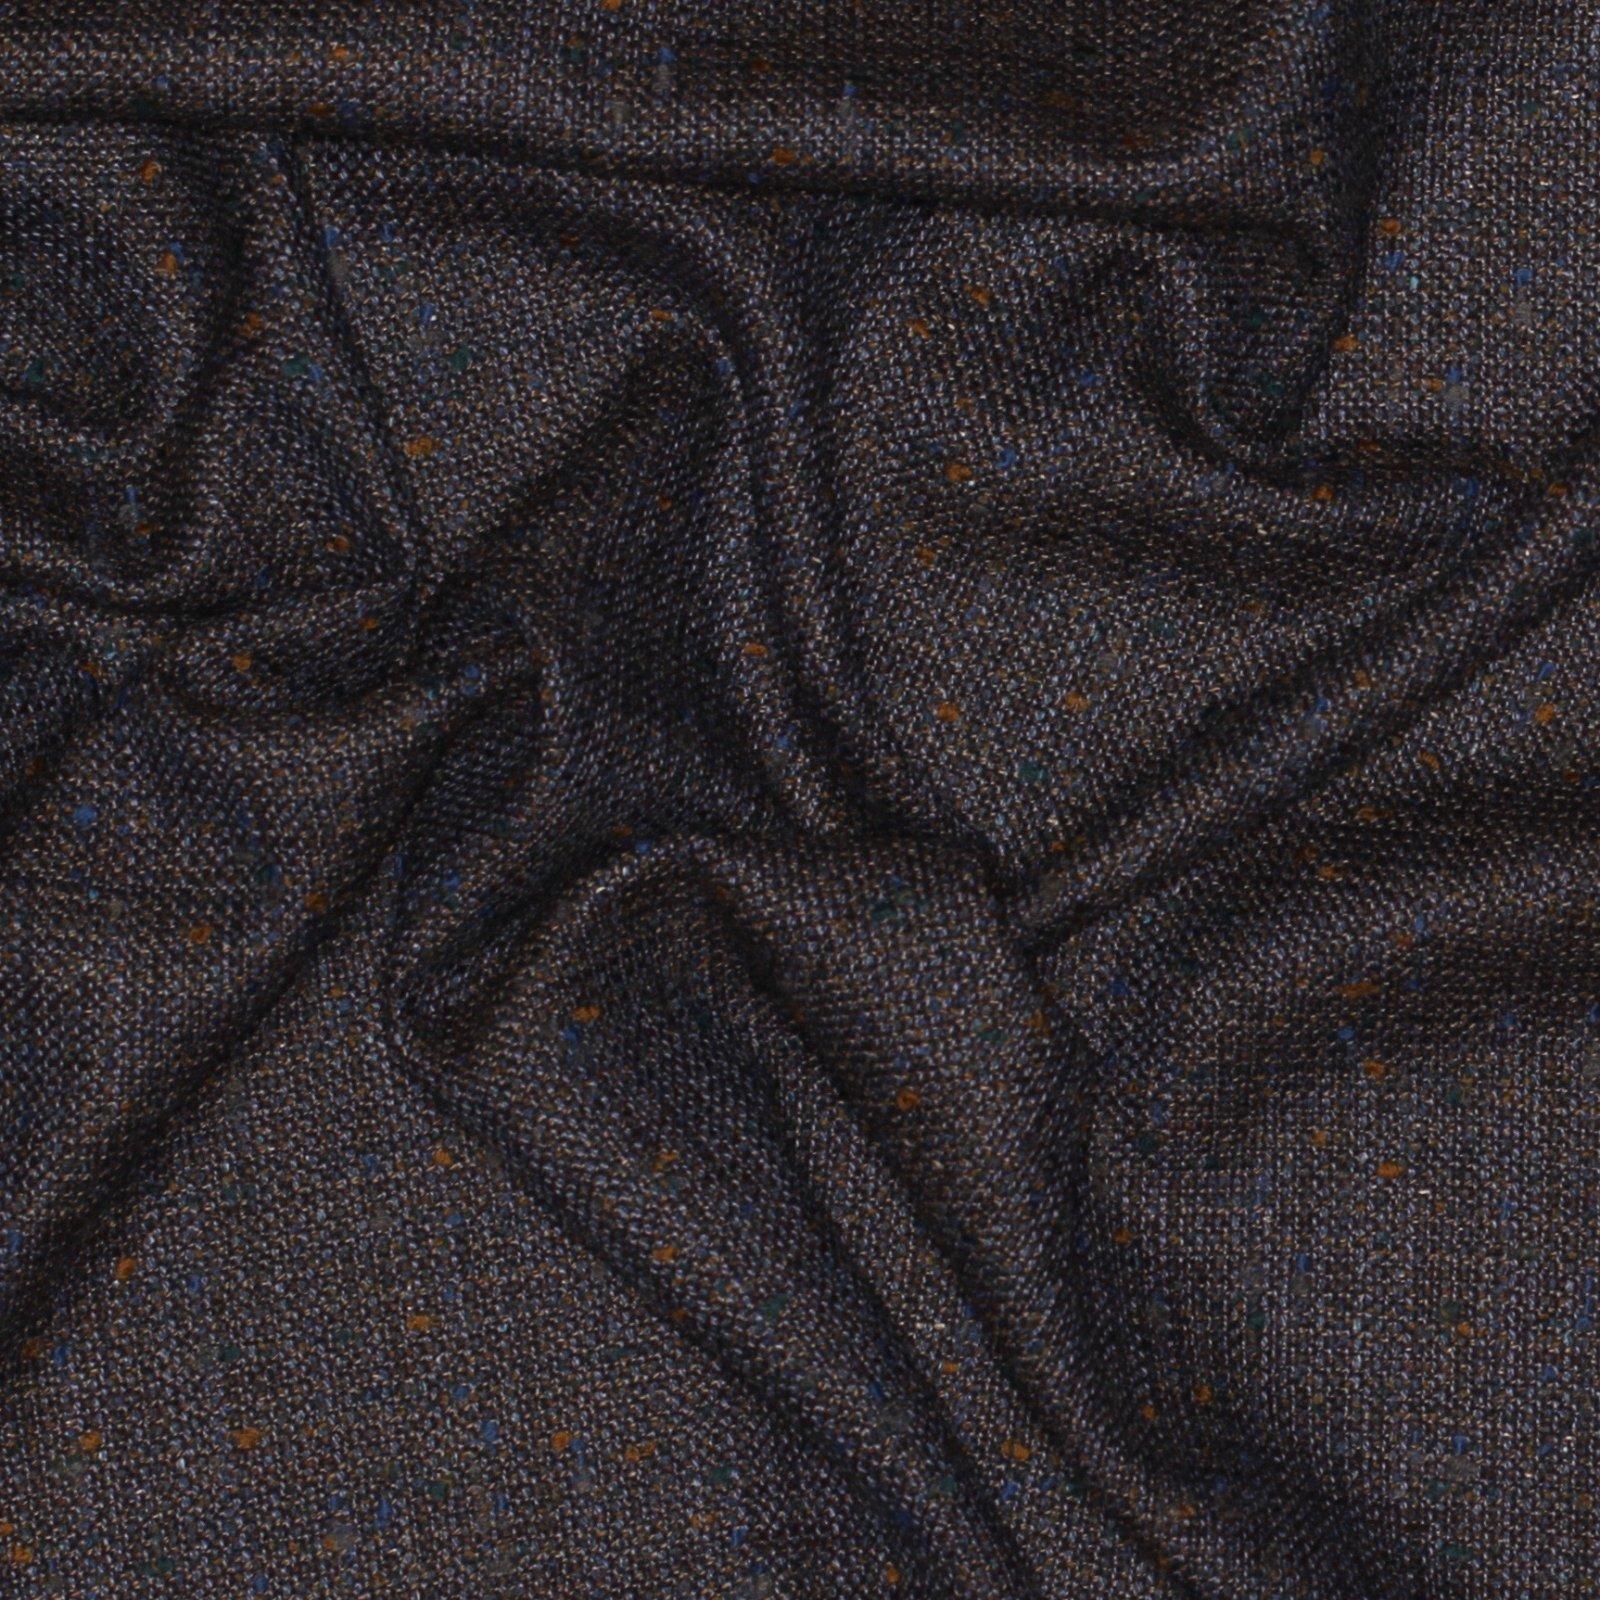 Blue/Teal/Mustard Fleck Italian Wool/Silk Tweed; 60